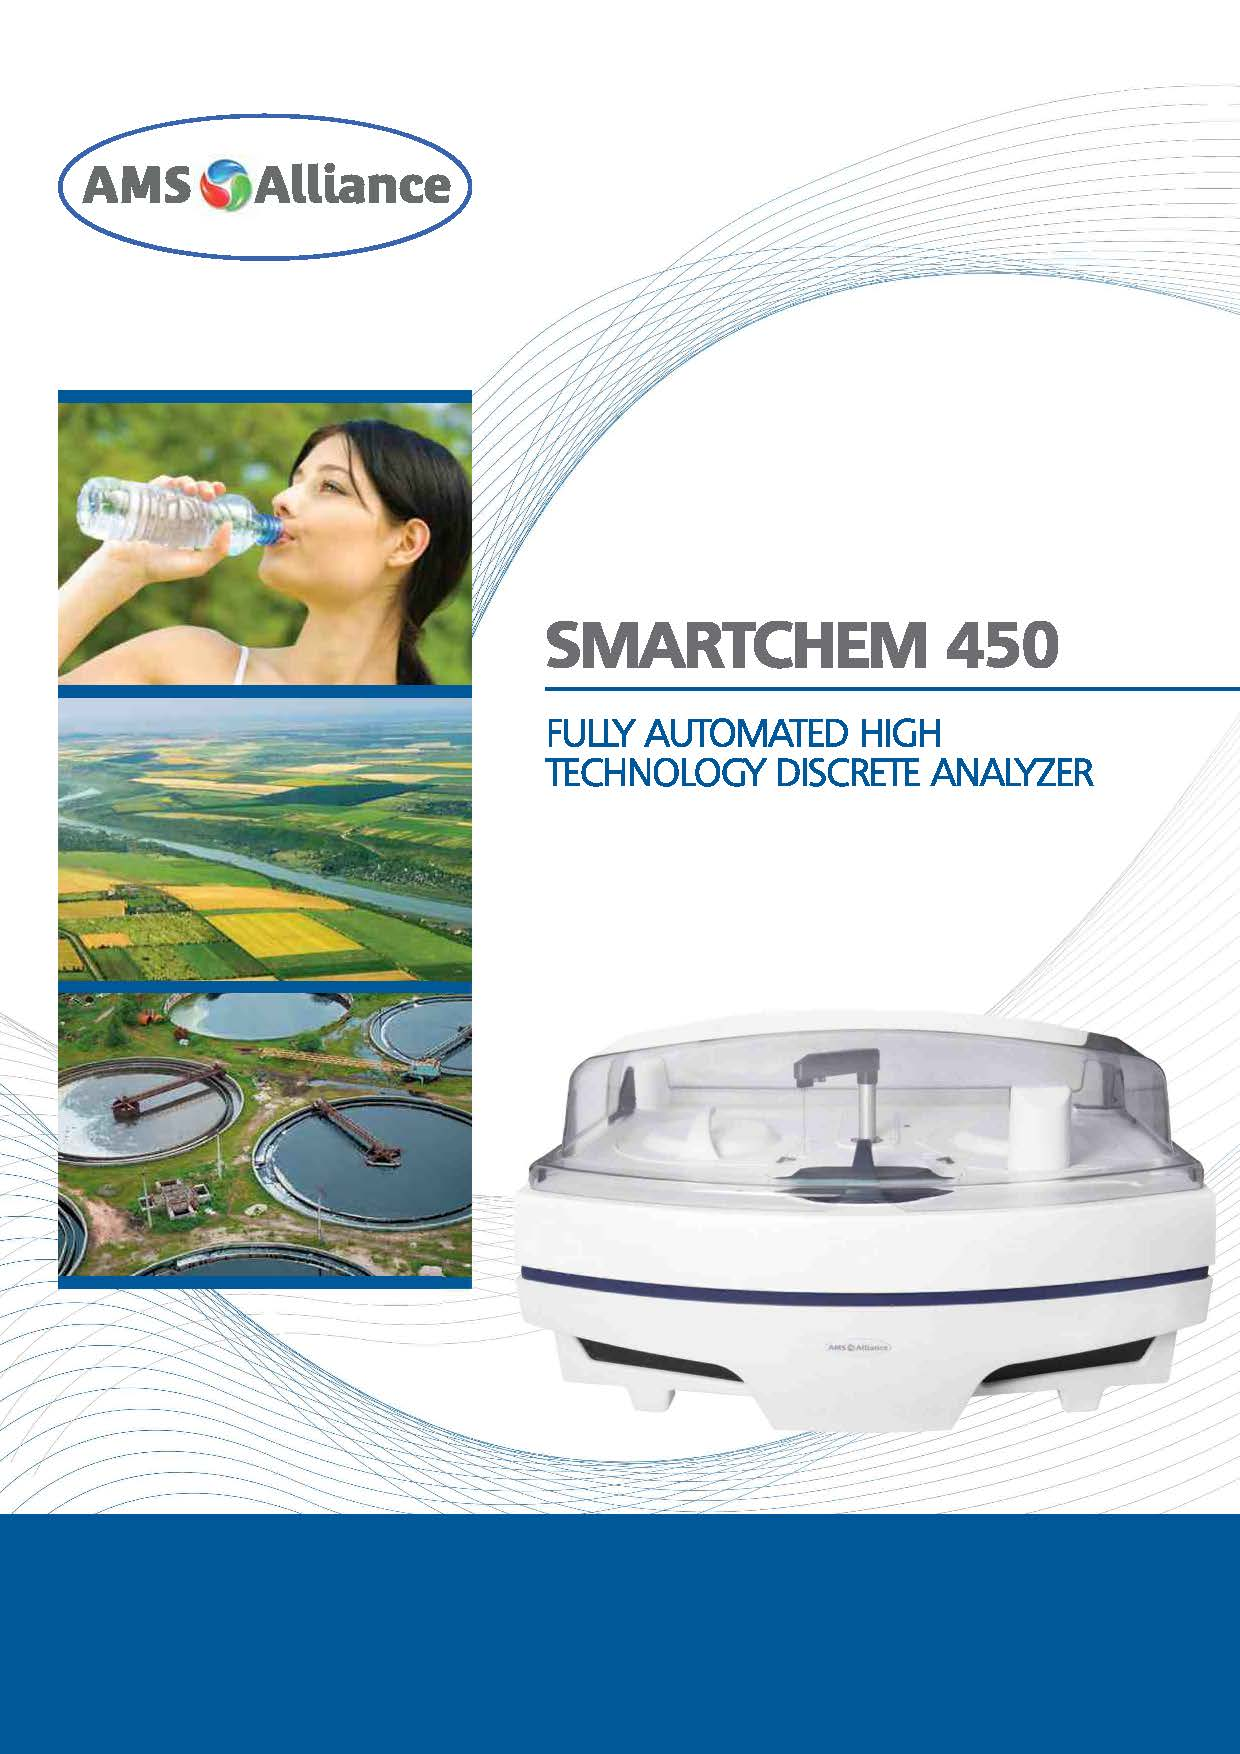 Smartchem 450